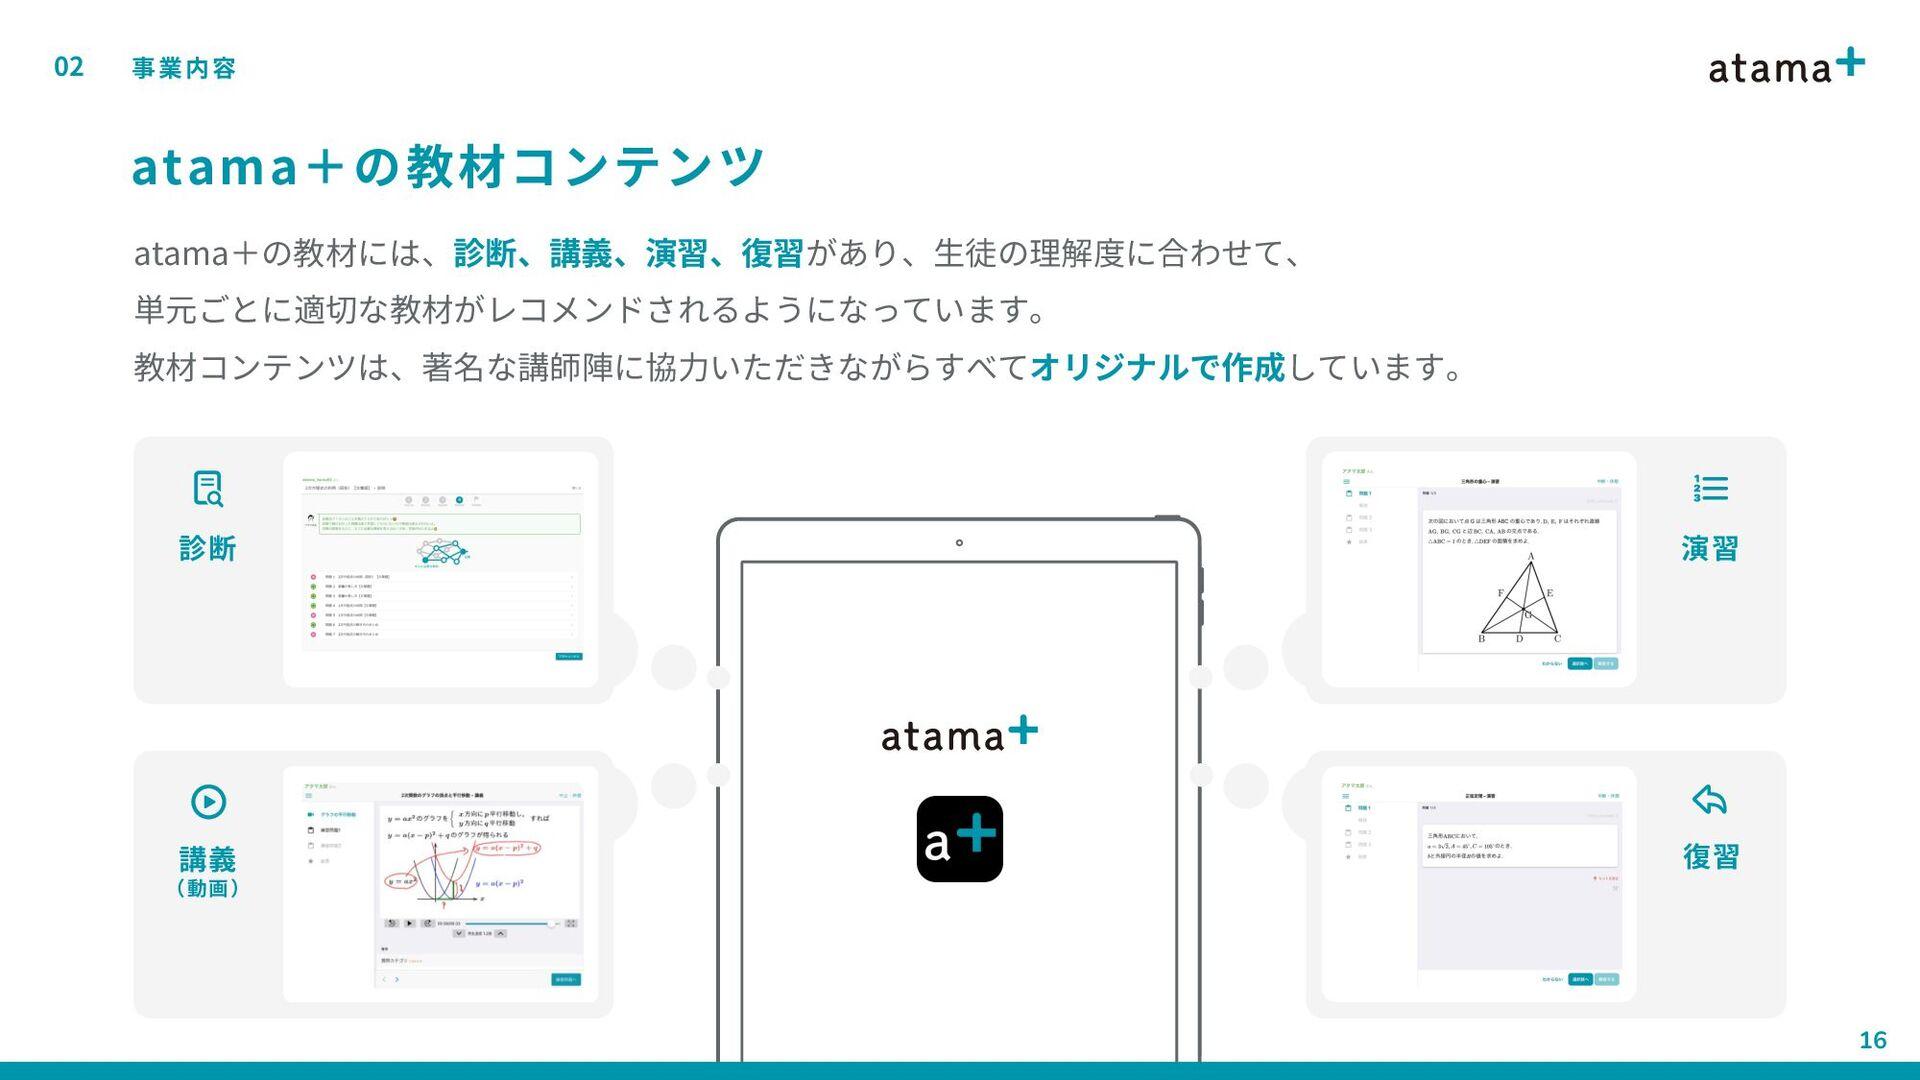 02 15 atama+の教材コンテンツ 事業内容 atama+の教材には、診断、講義、演習、...